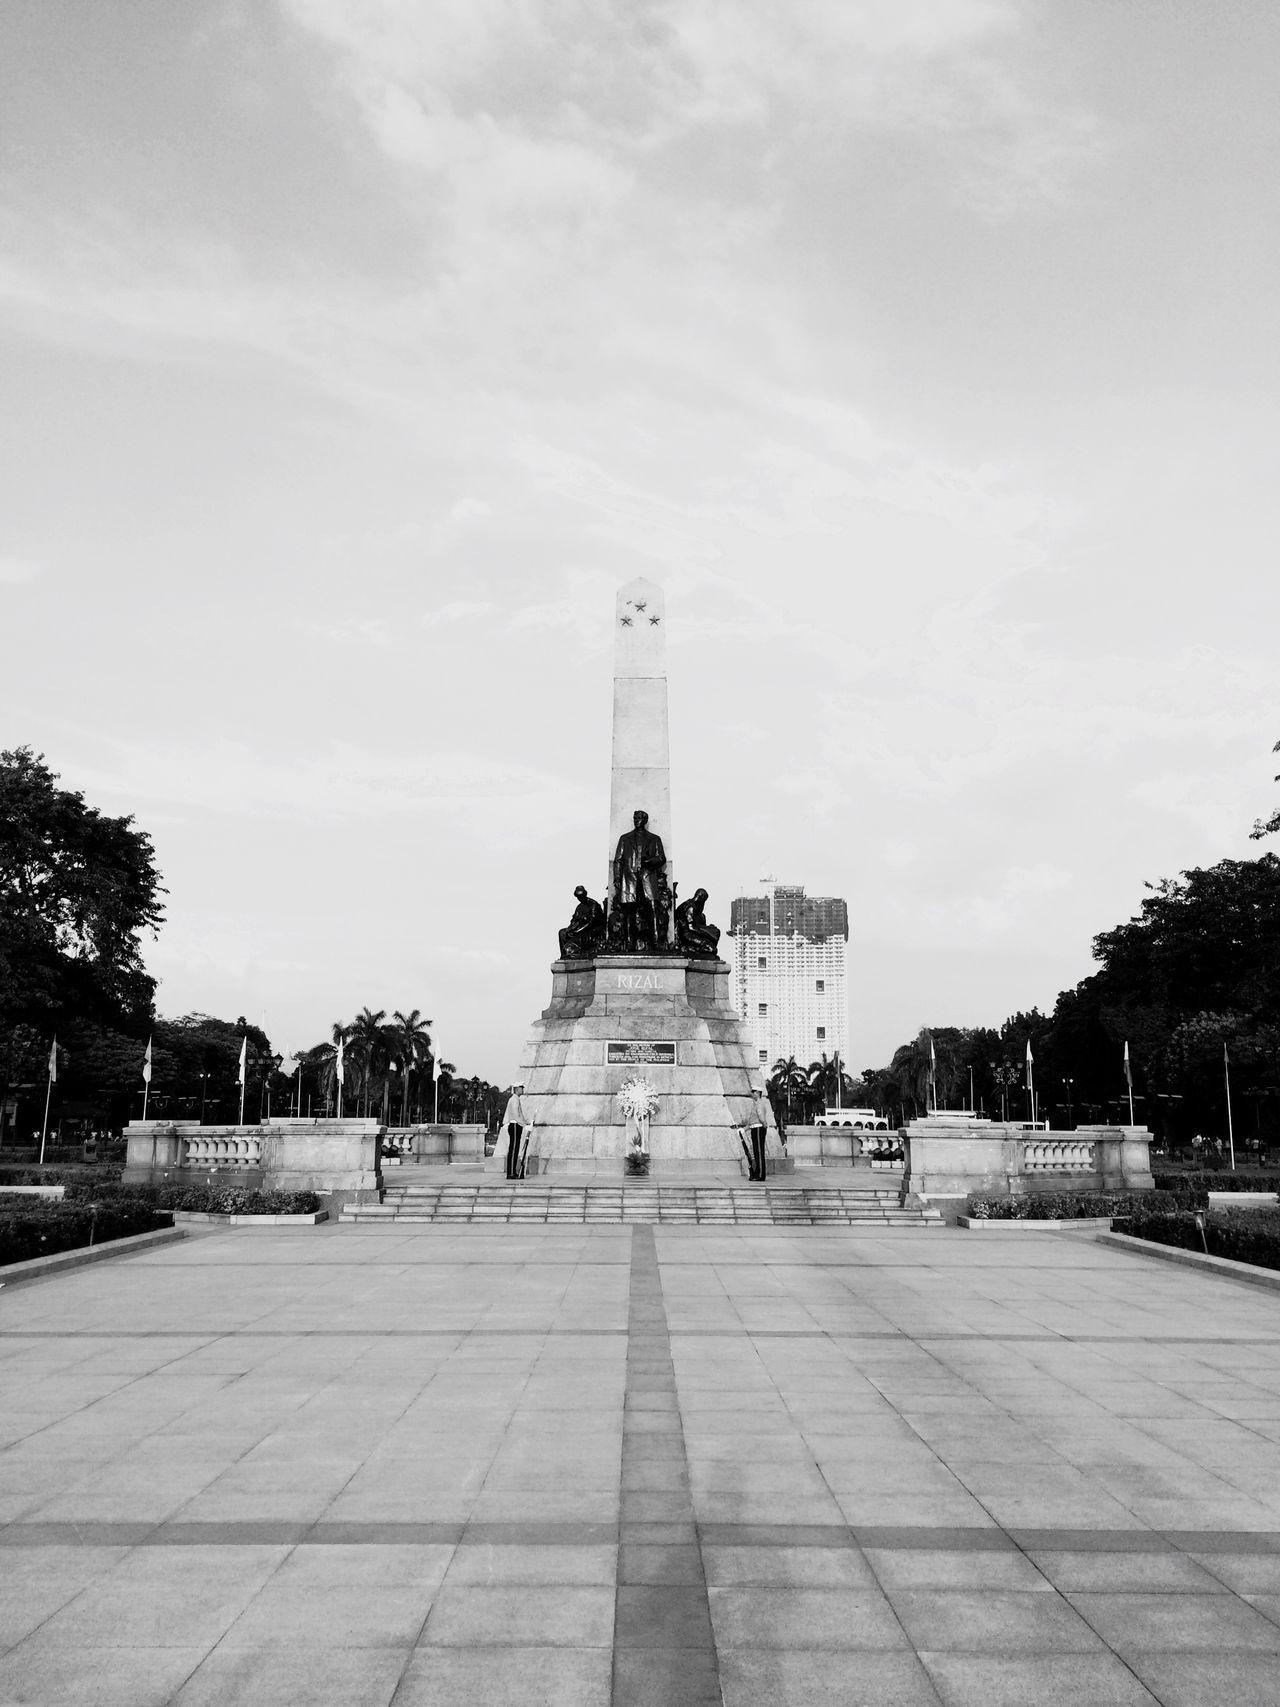 Travel Destinations Blackandwhite Bnw Luneta Park